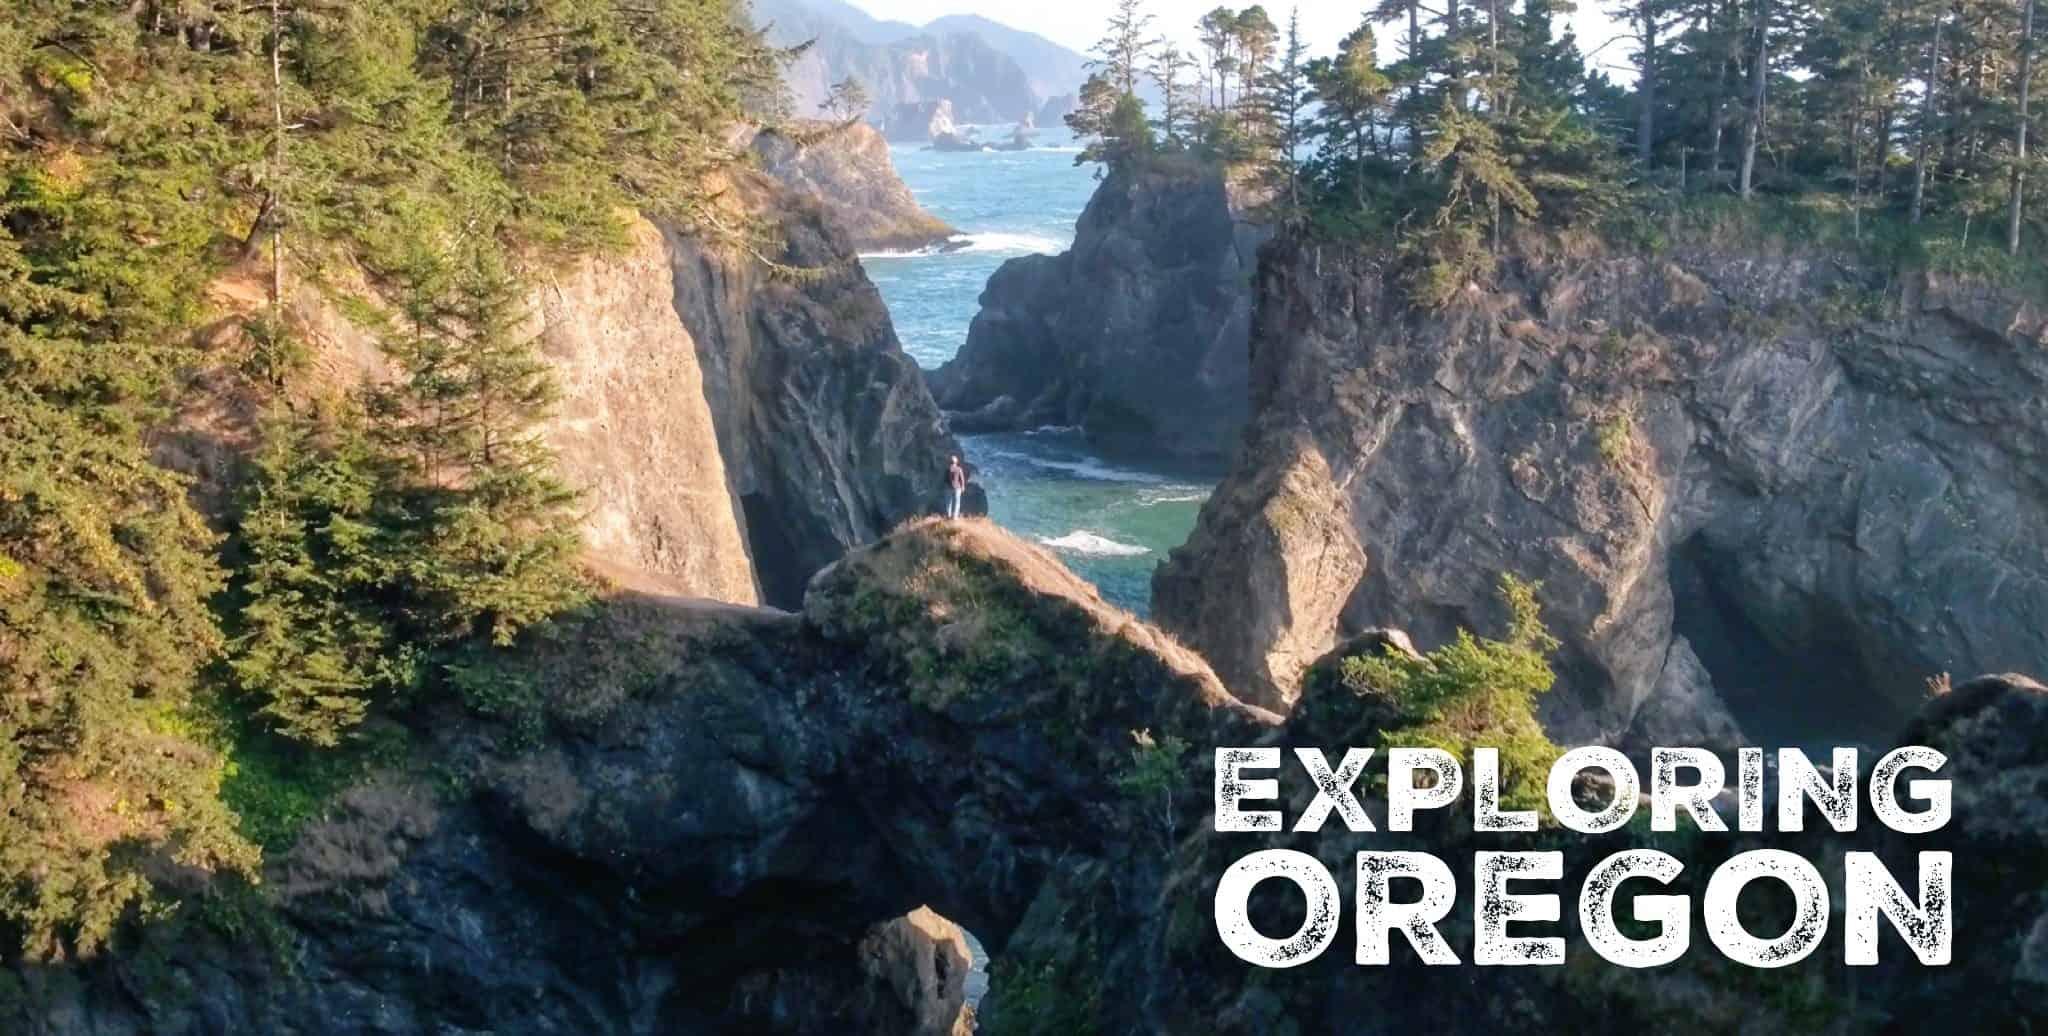 exploring-oregon-scenic-drone-video-dji